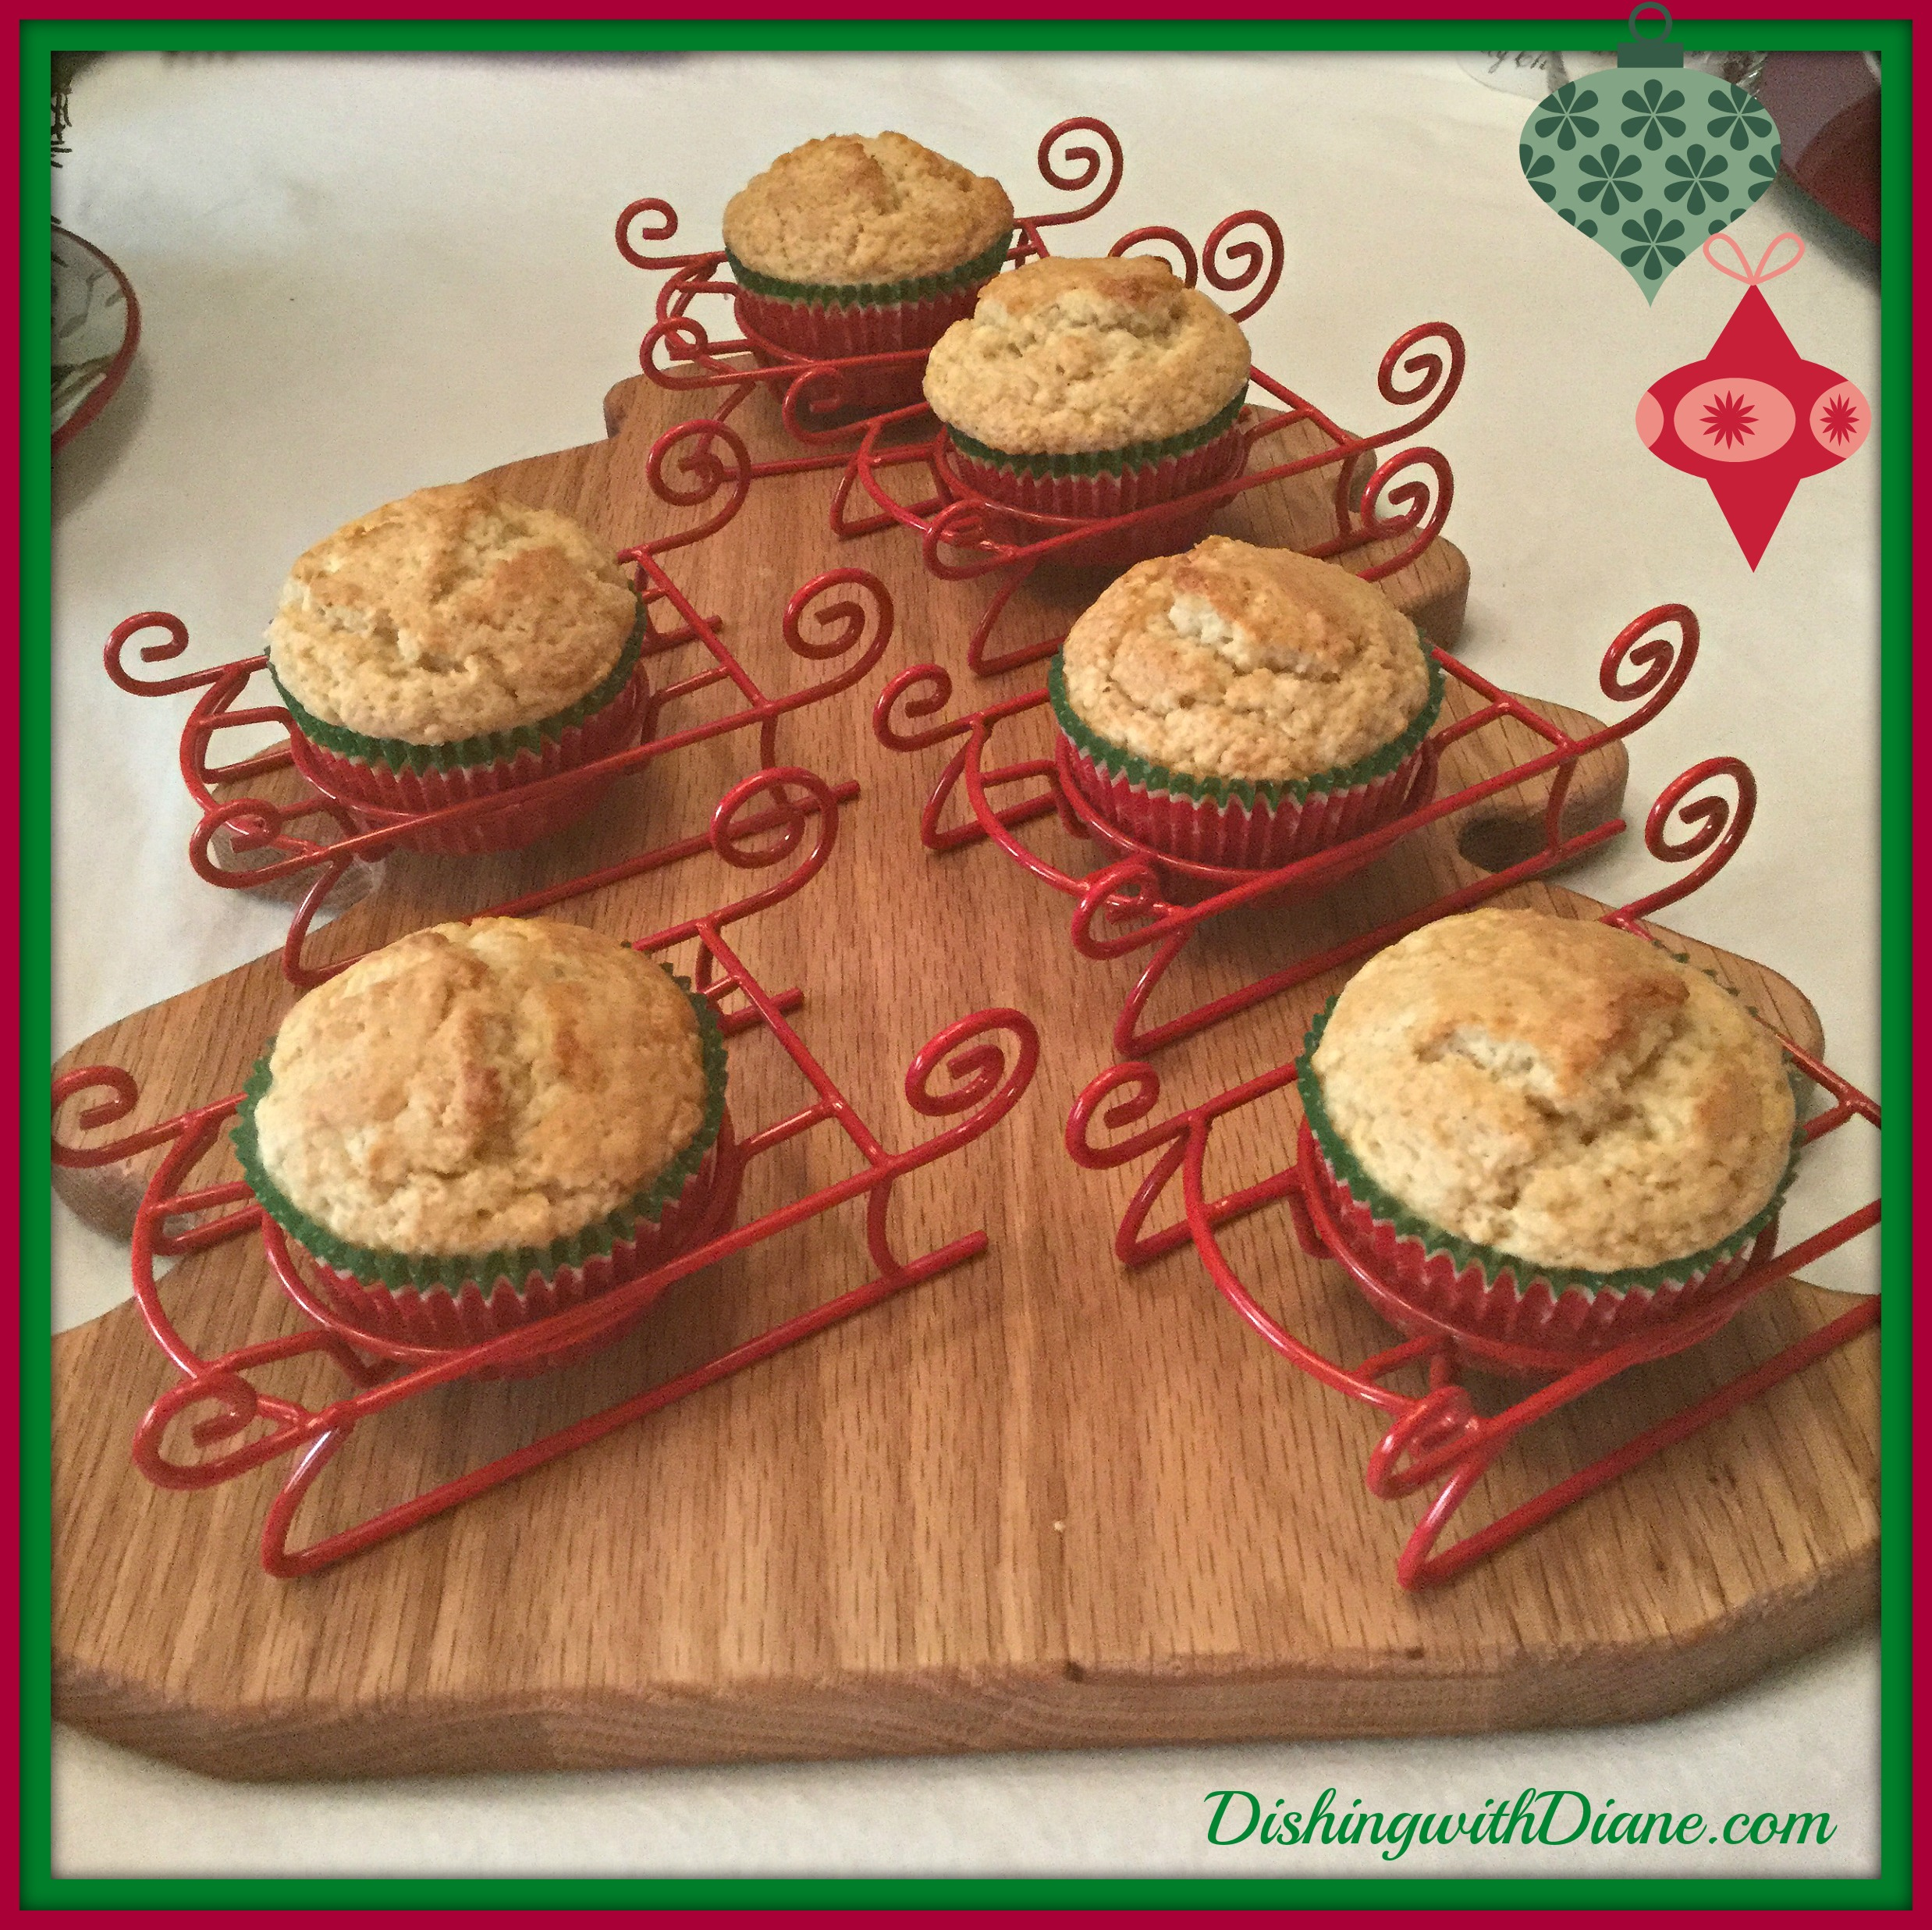 2016-12-27-13-54-27-muffins-on-board